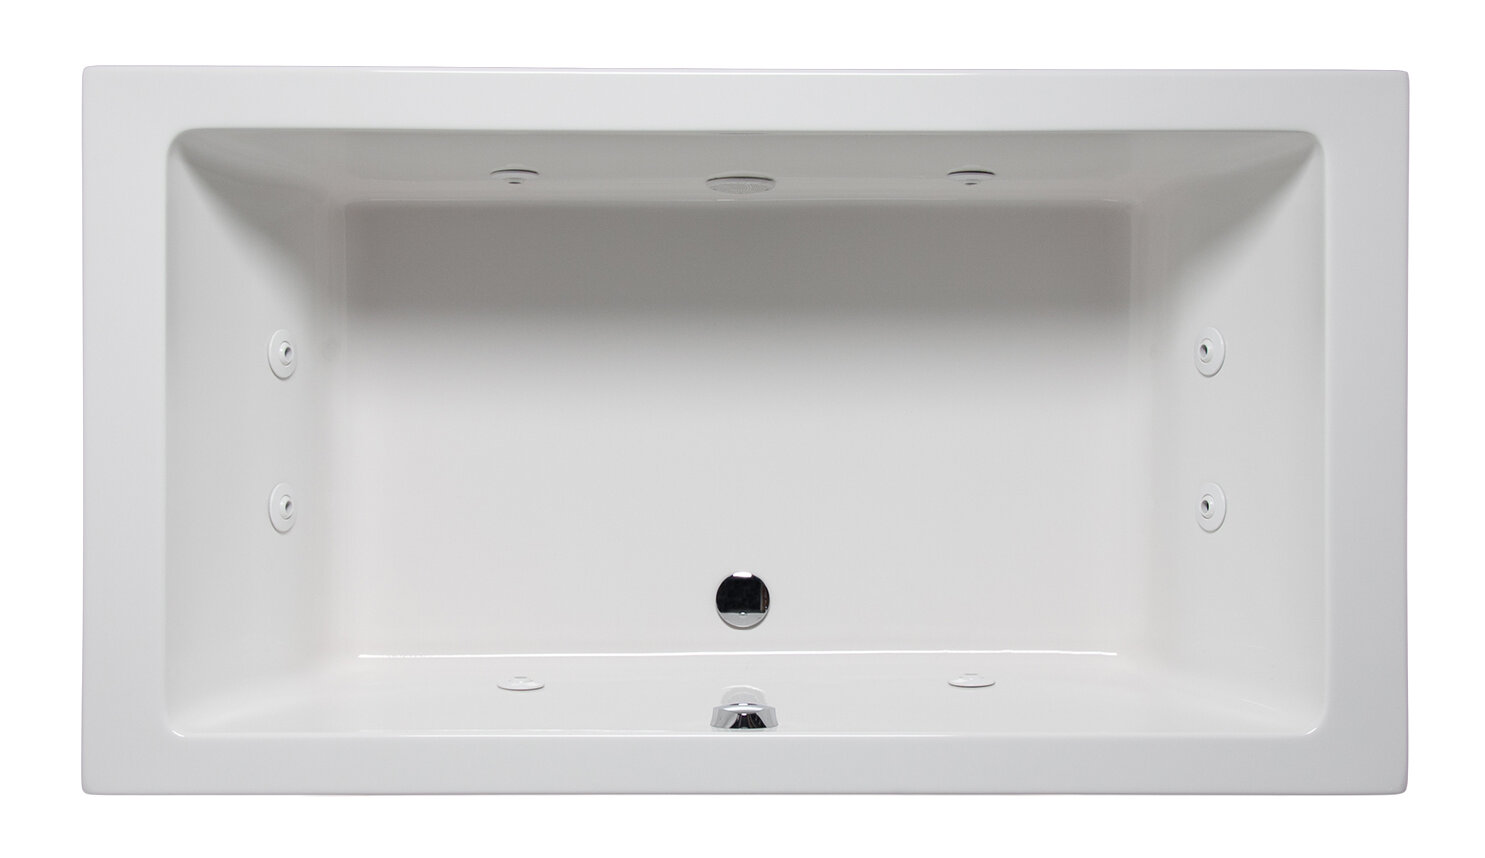 Americh Vivo 72 X 36 Drop In Whirlpool Bathtub Wayfair